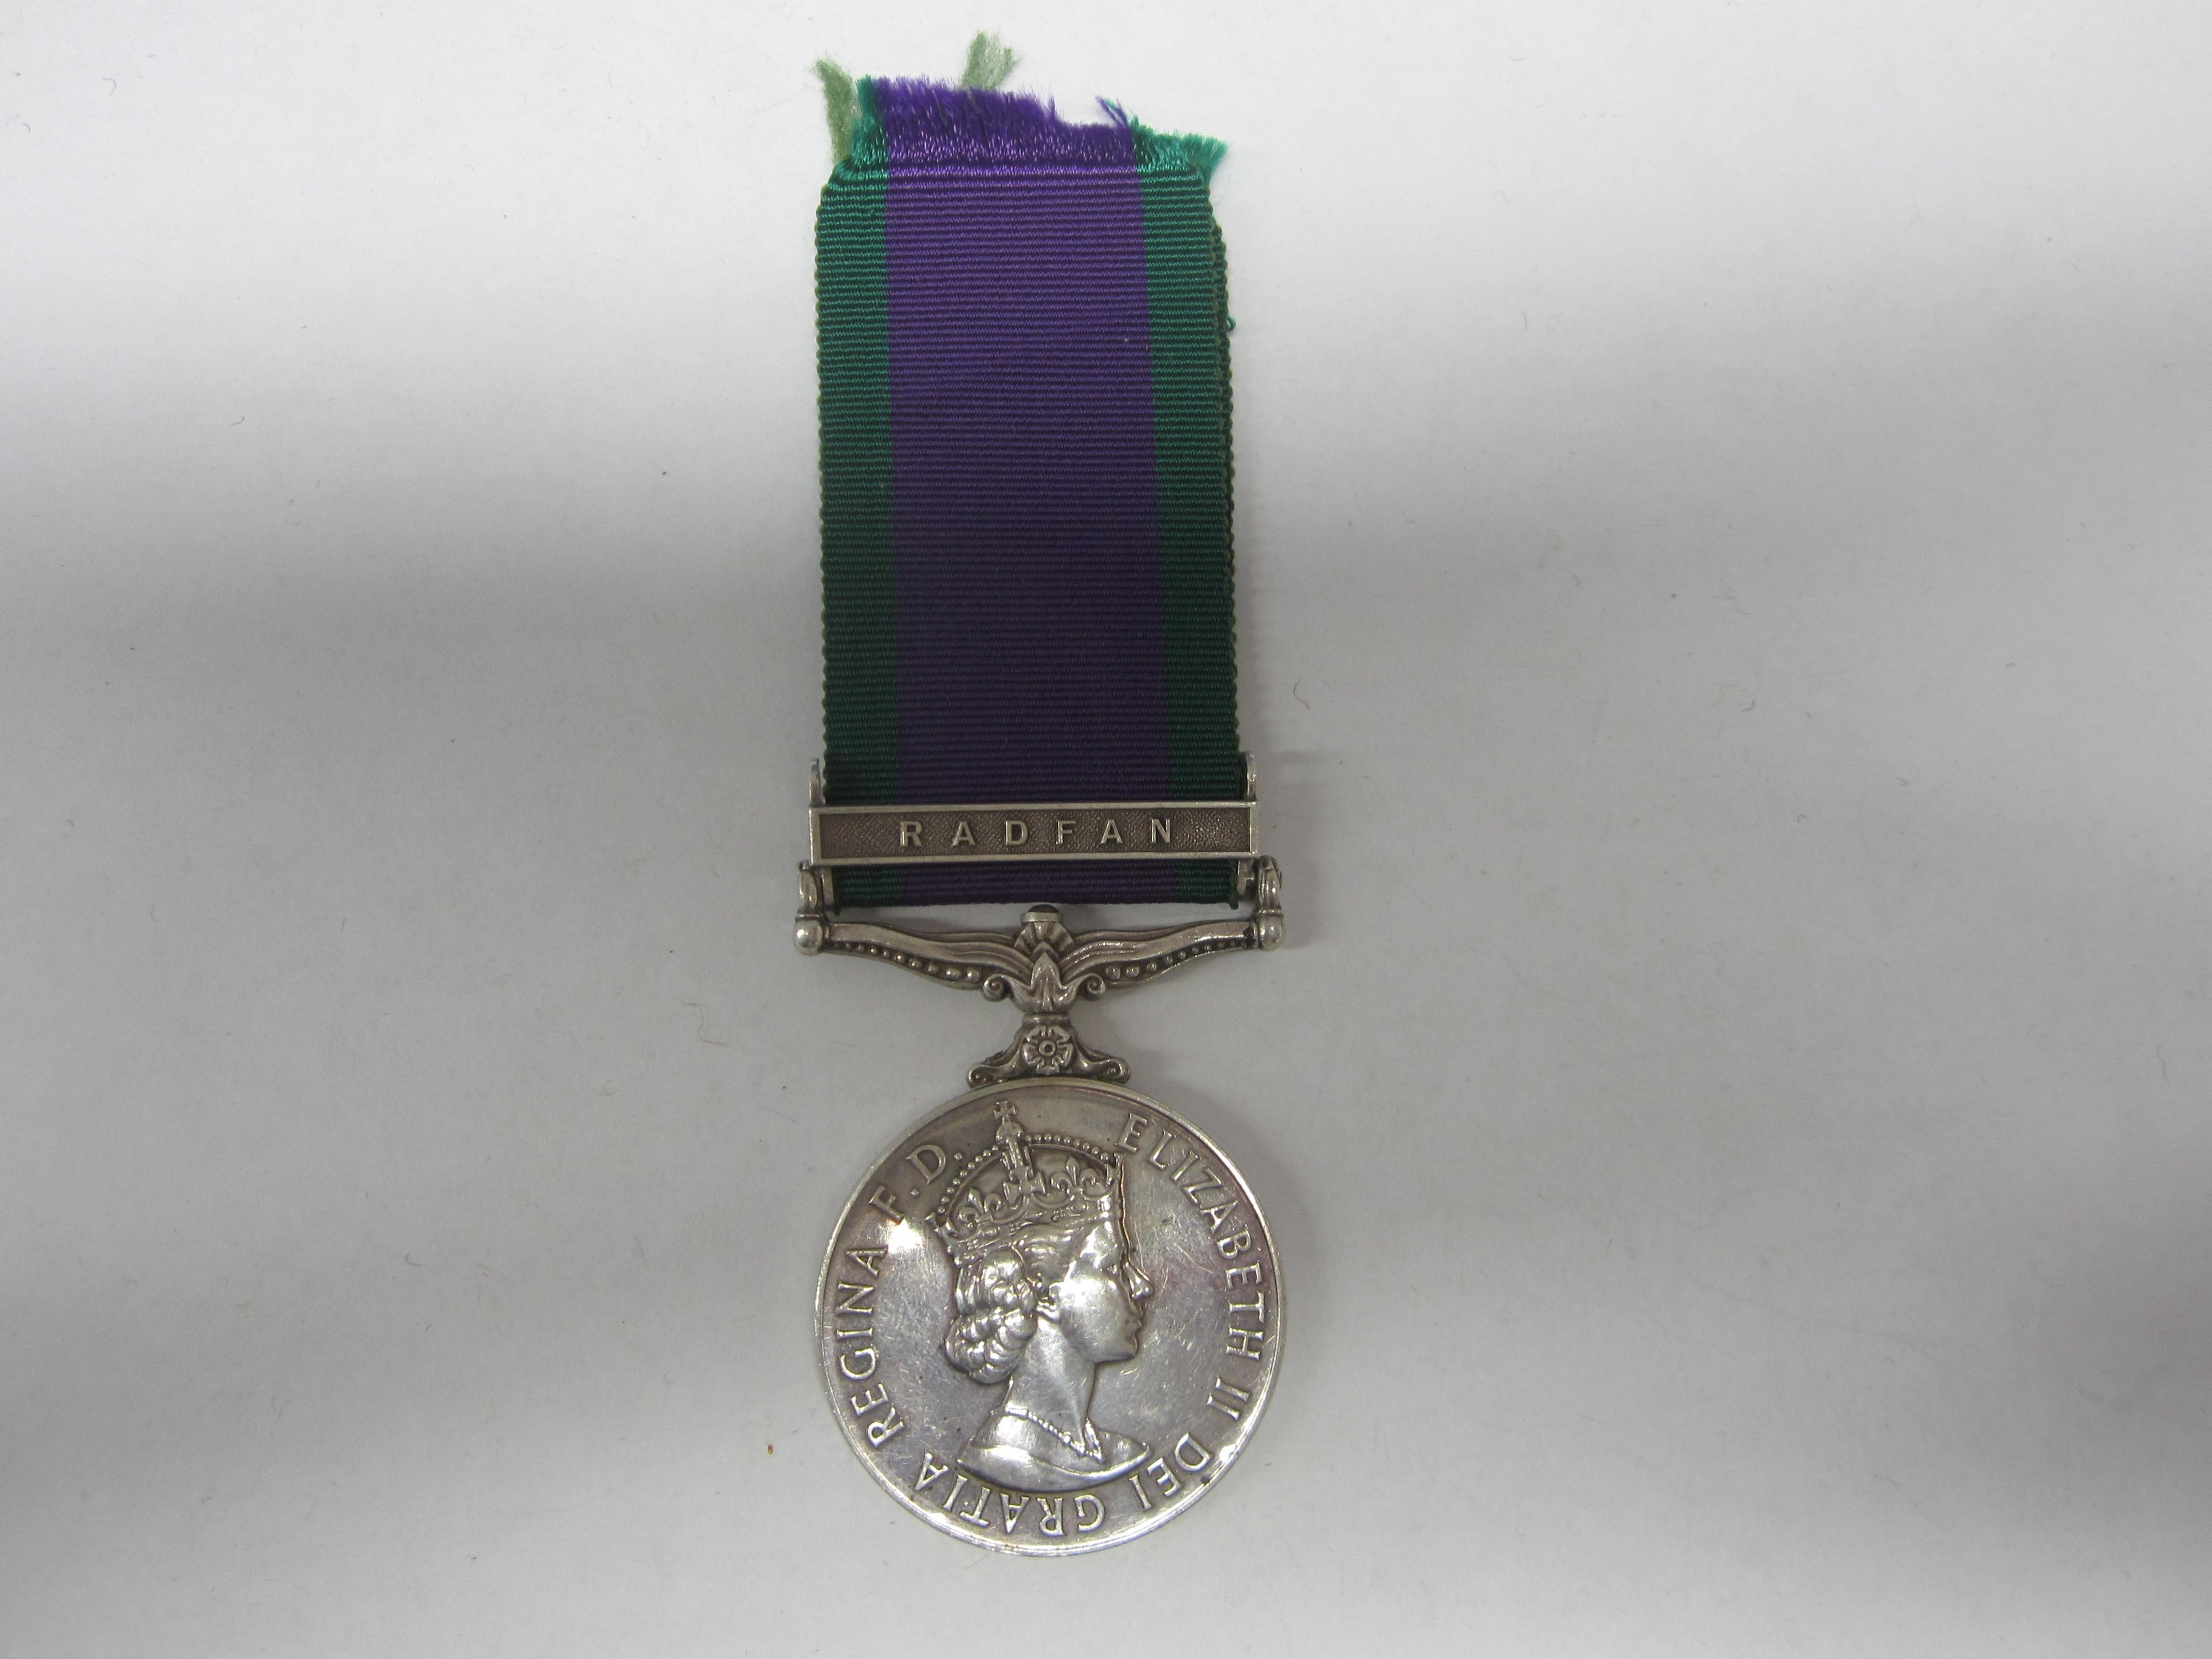 Lot 59 - Campaign Service Medal 1962,